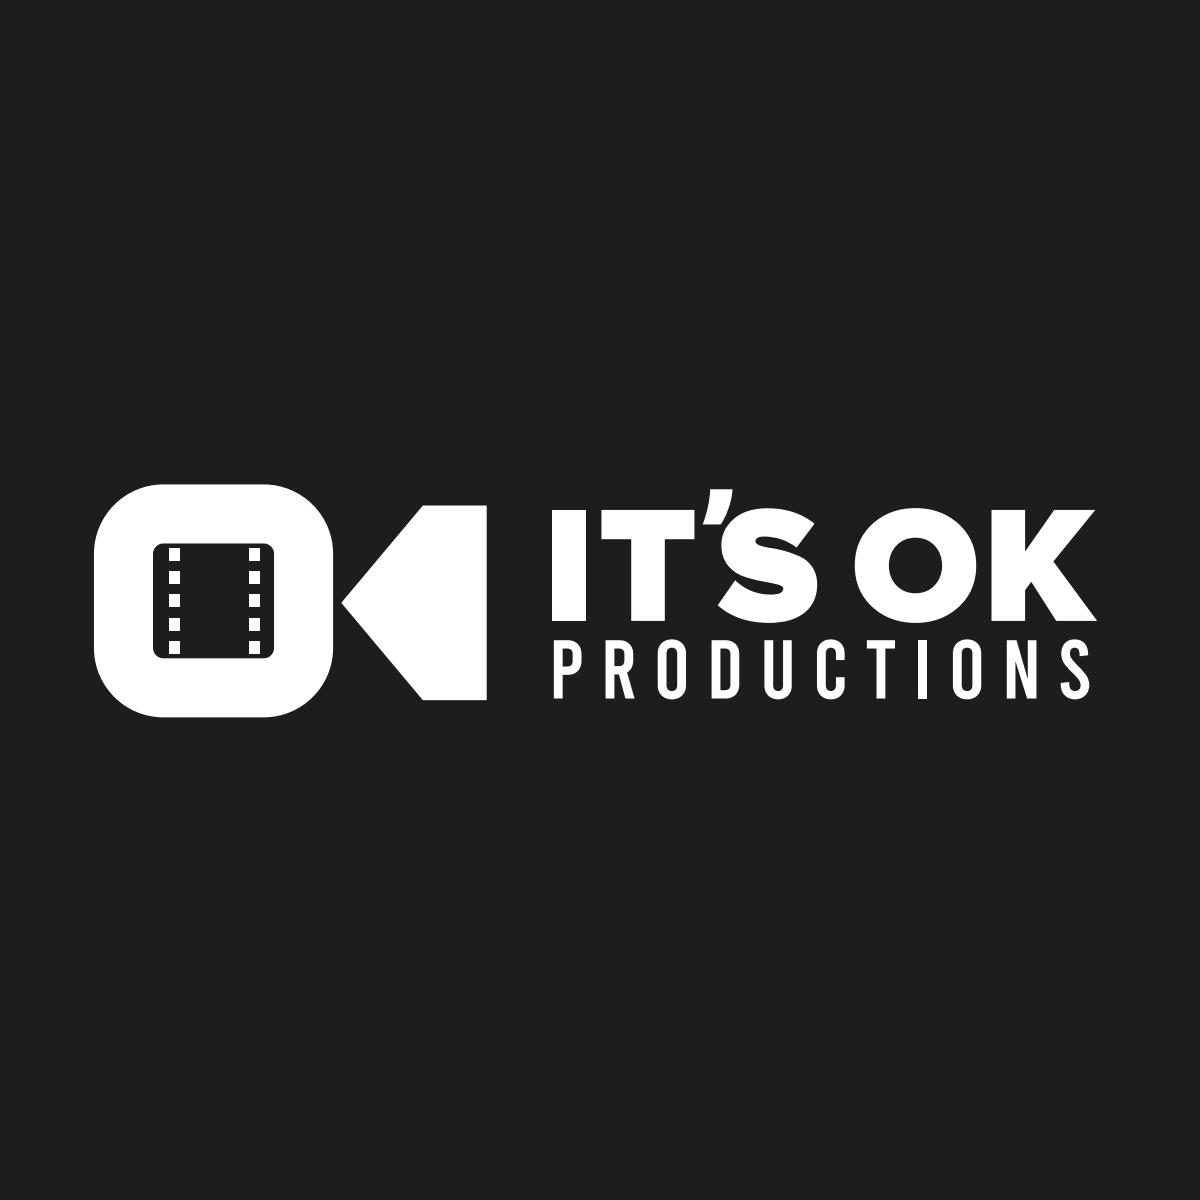 It's O.K Productions Inc.